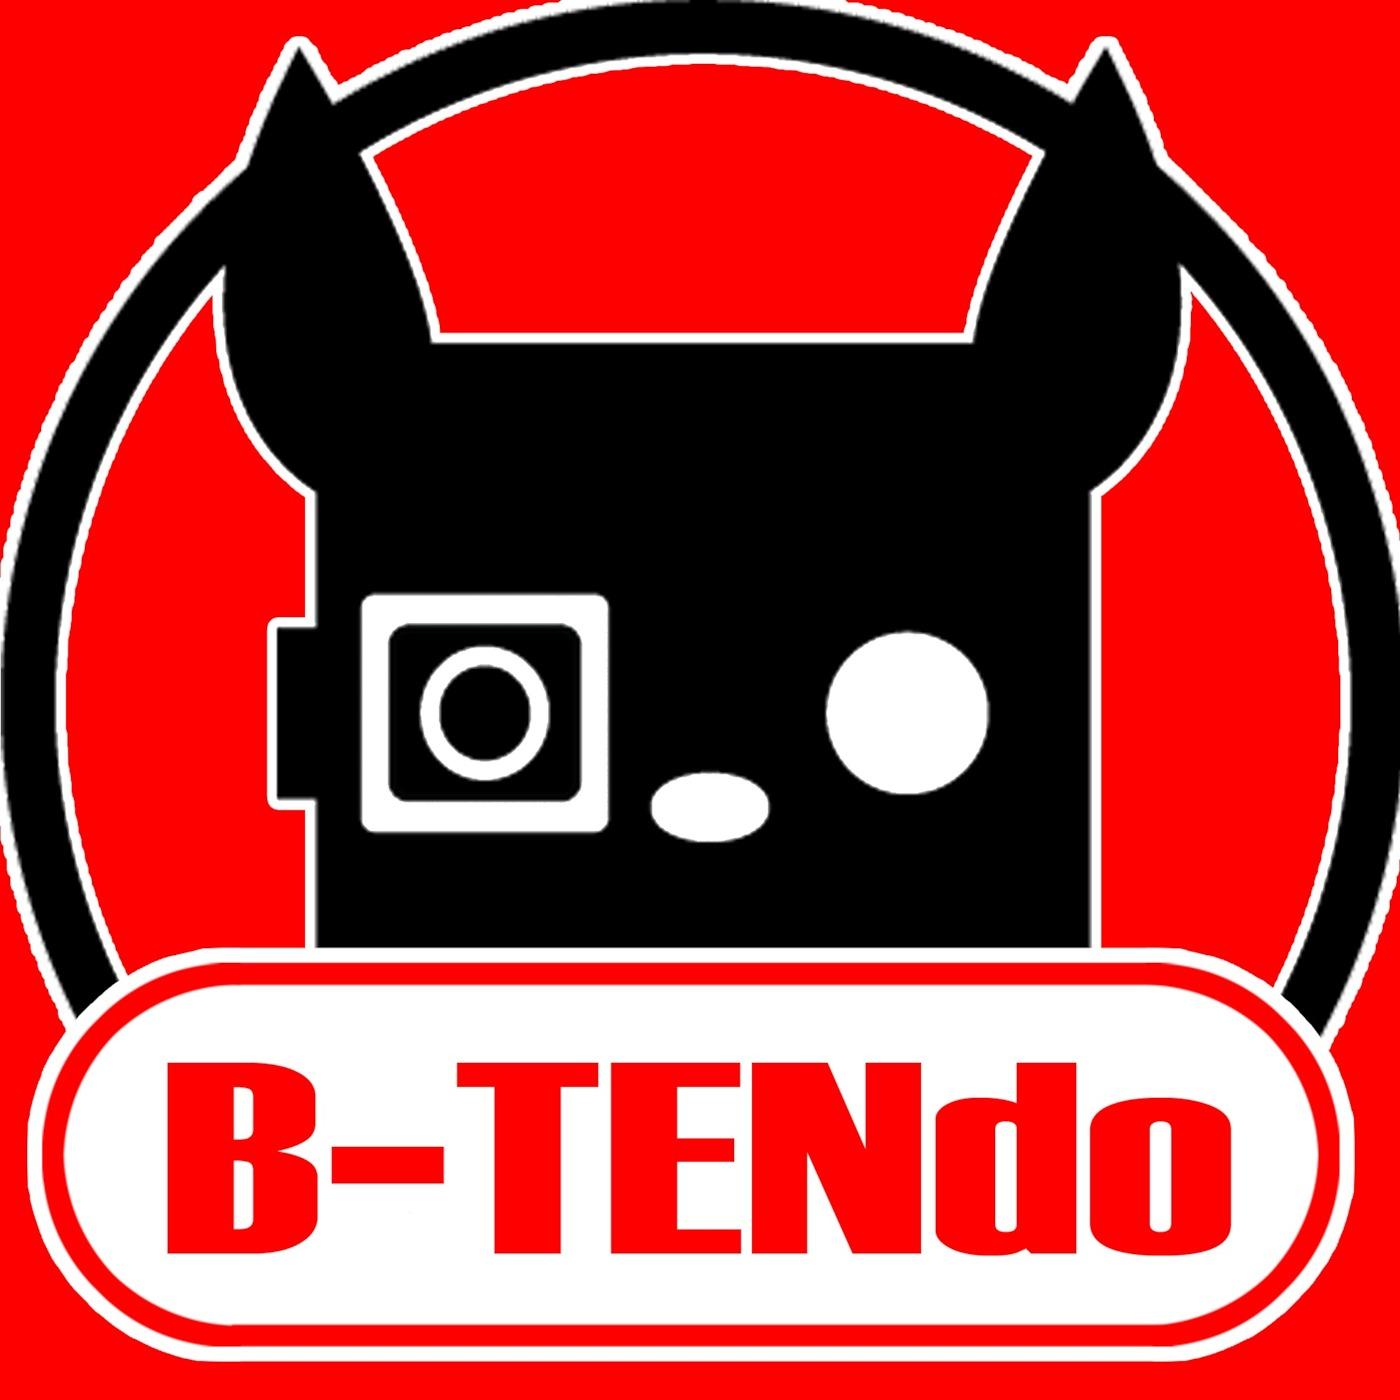 B-TENdo